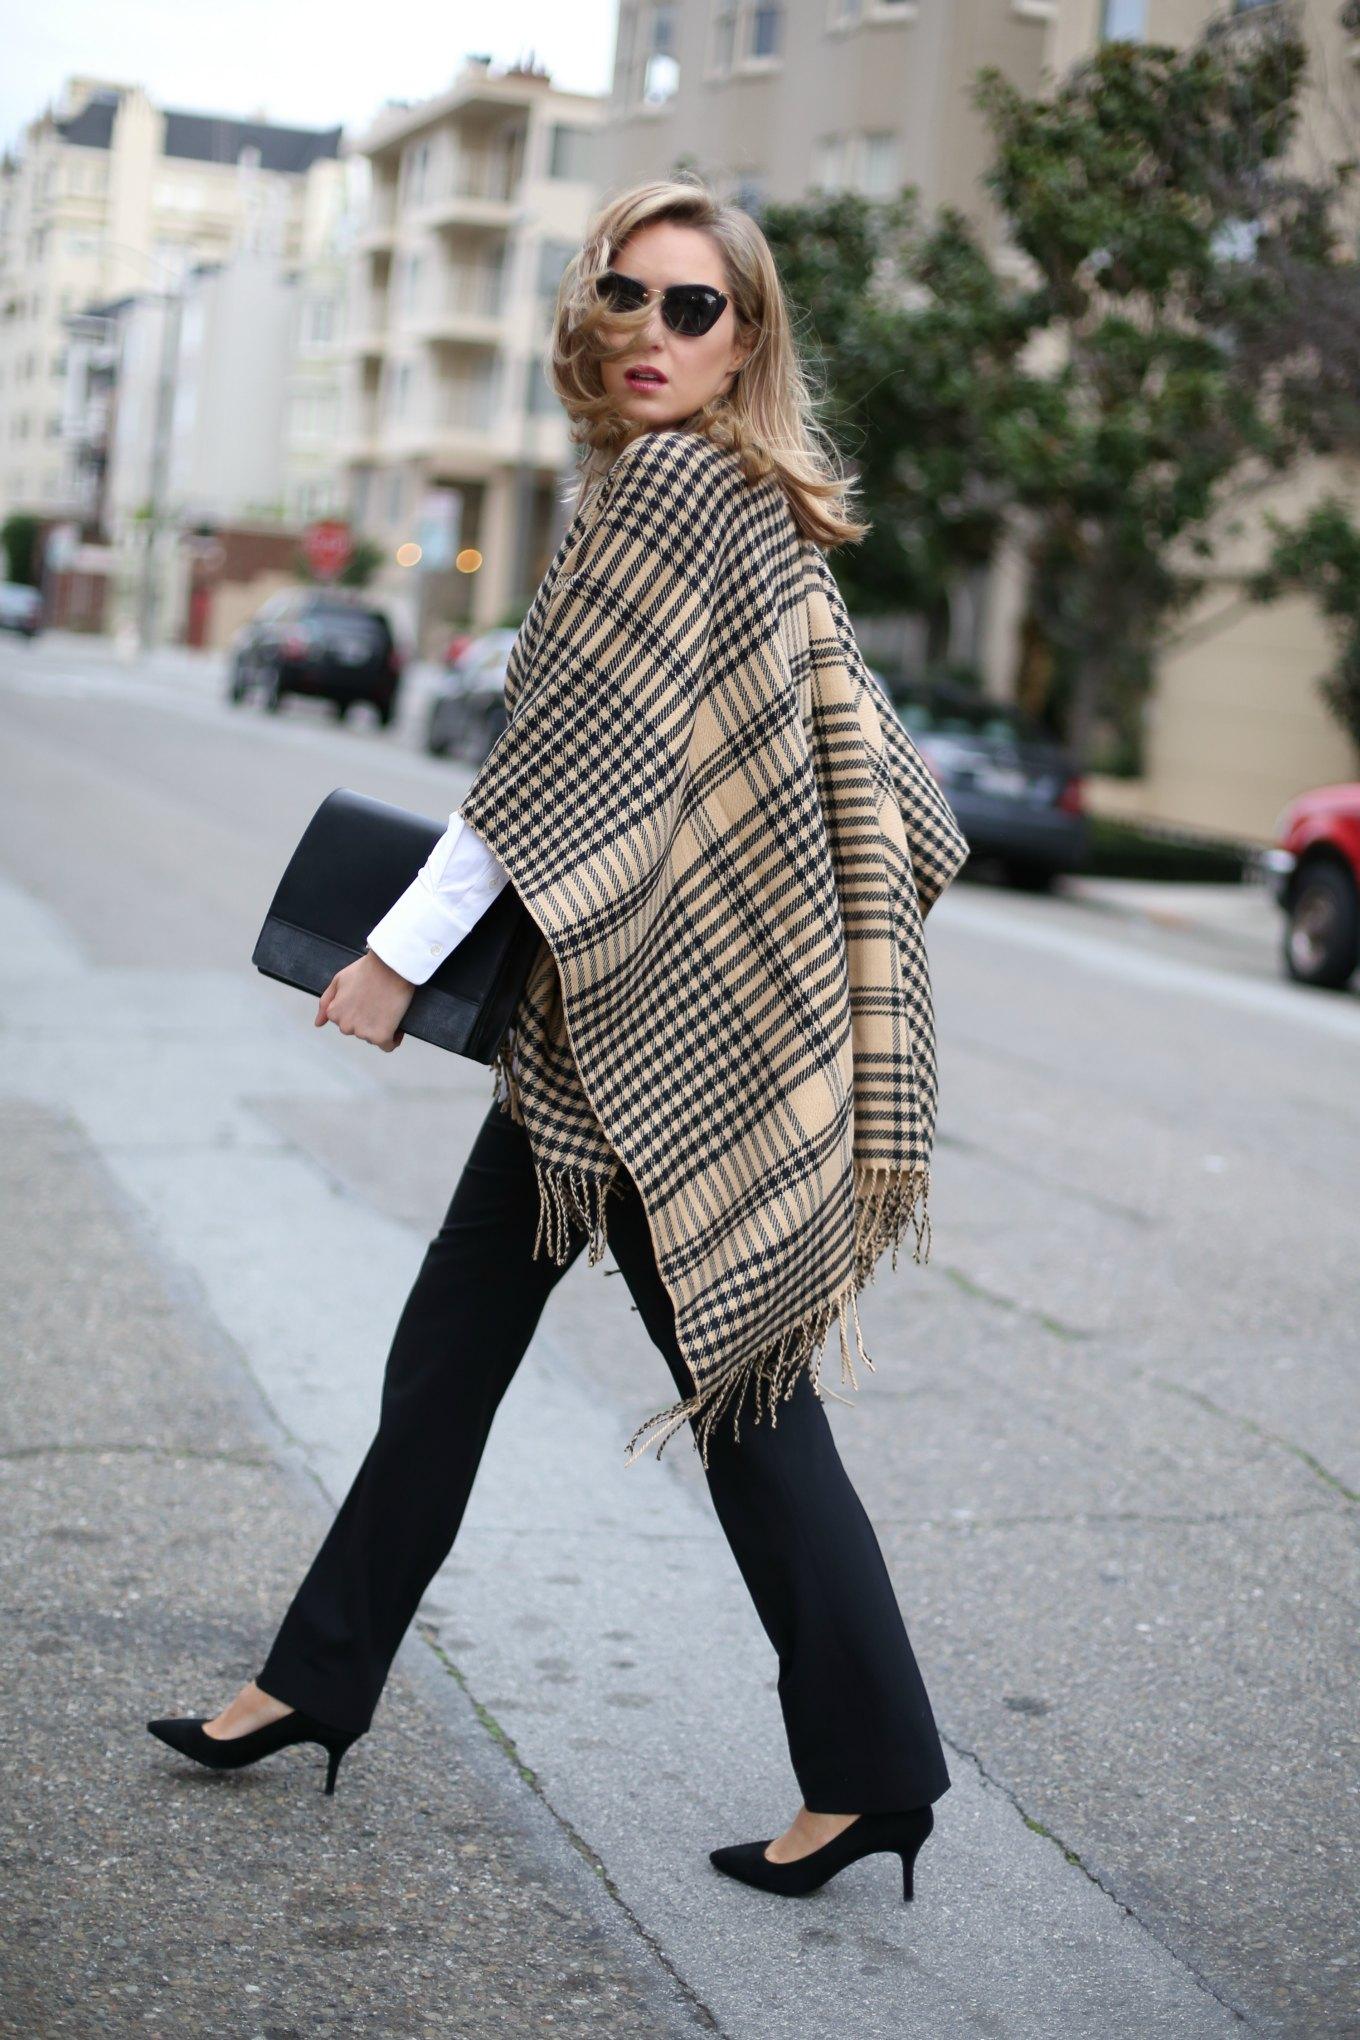 camel-black-plaid-fringe-cape-black-dress-pants-theory-long-shirt-clutch-bow-back-heels-mary-orton-sf-style-blog3